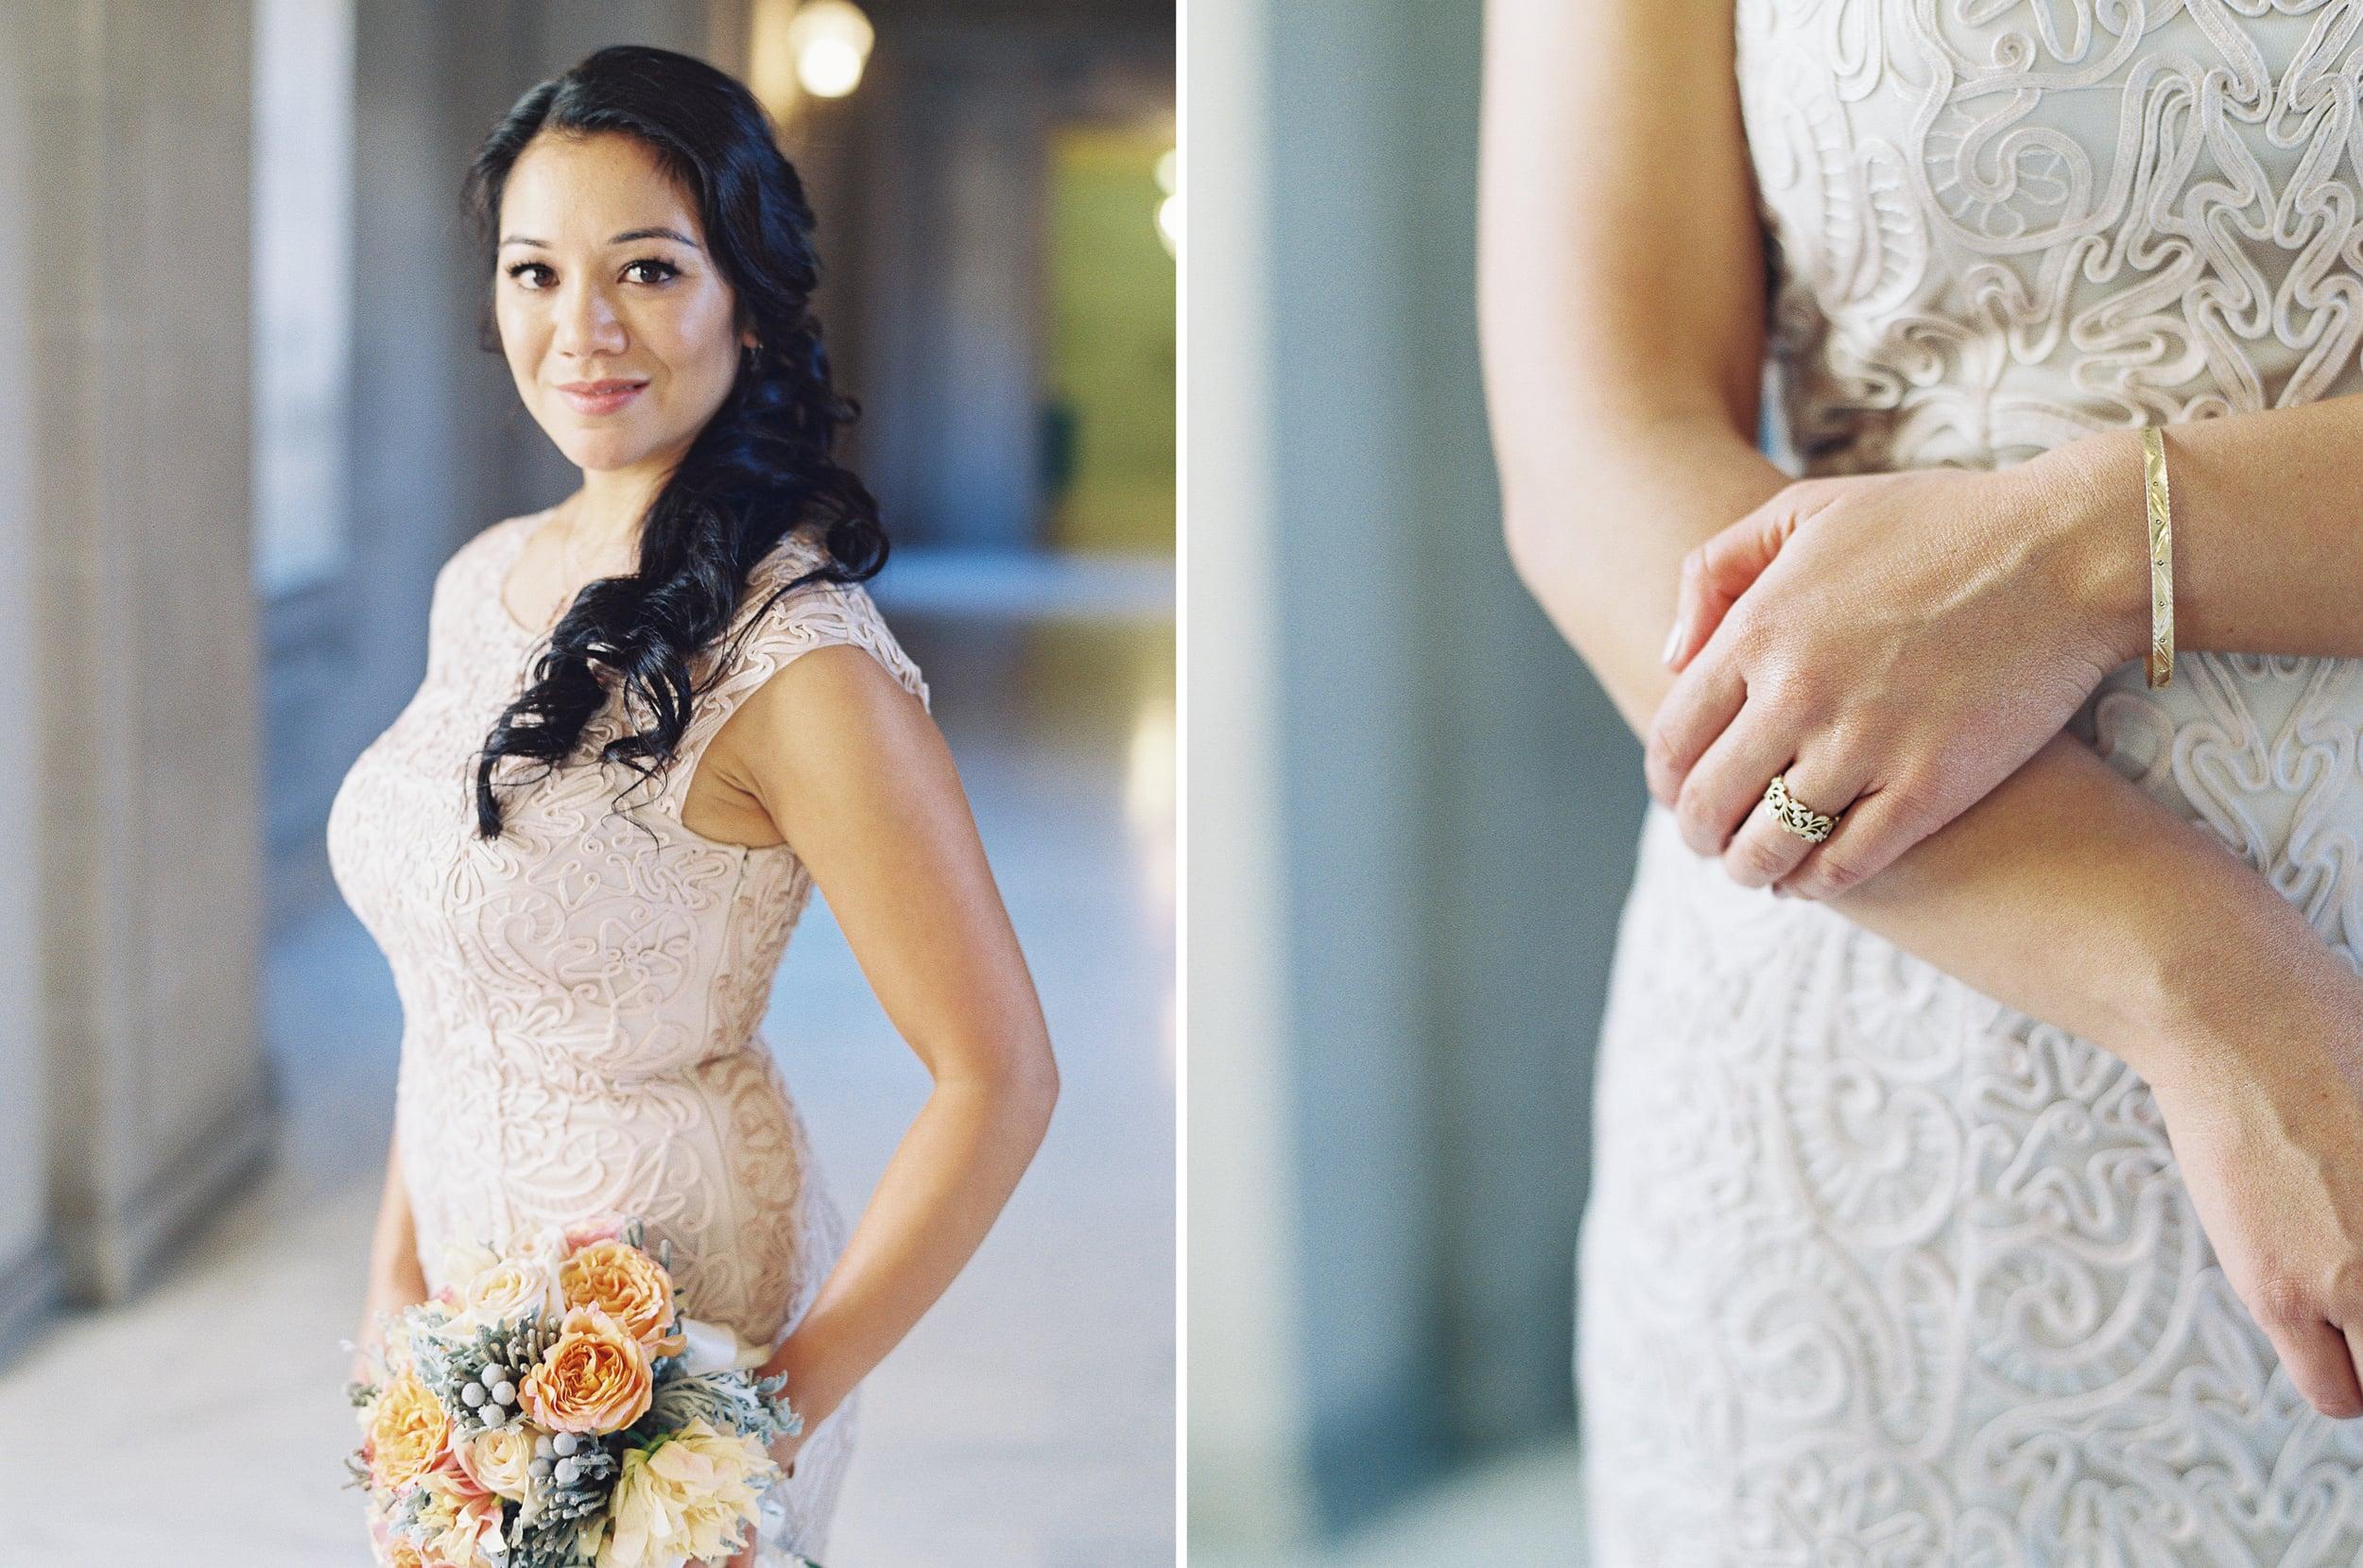 Meghan Mehan Photography - Fine Art Film Wedding Photography - California   San Francisco   Napa   Sonoma   Carmel   Big Sur   Nashville   Tennessee - 052.jpg